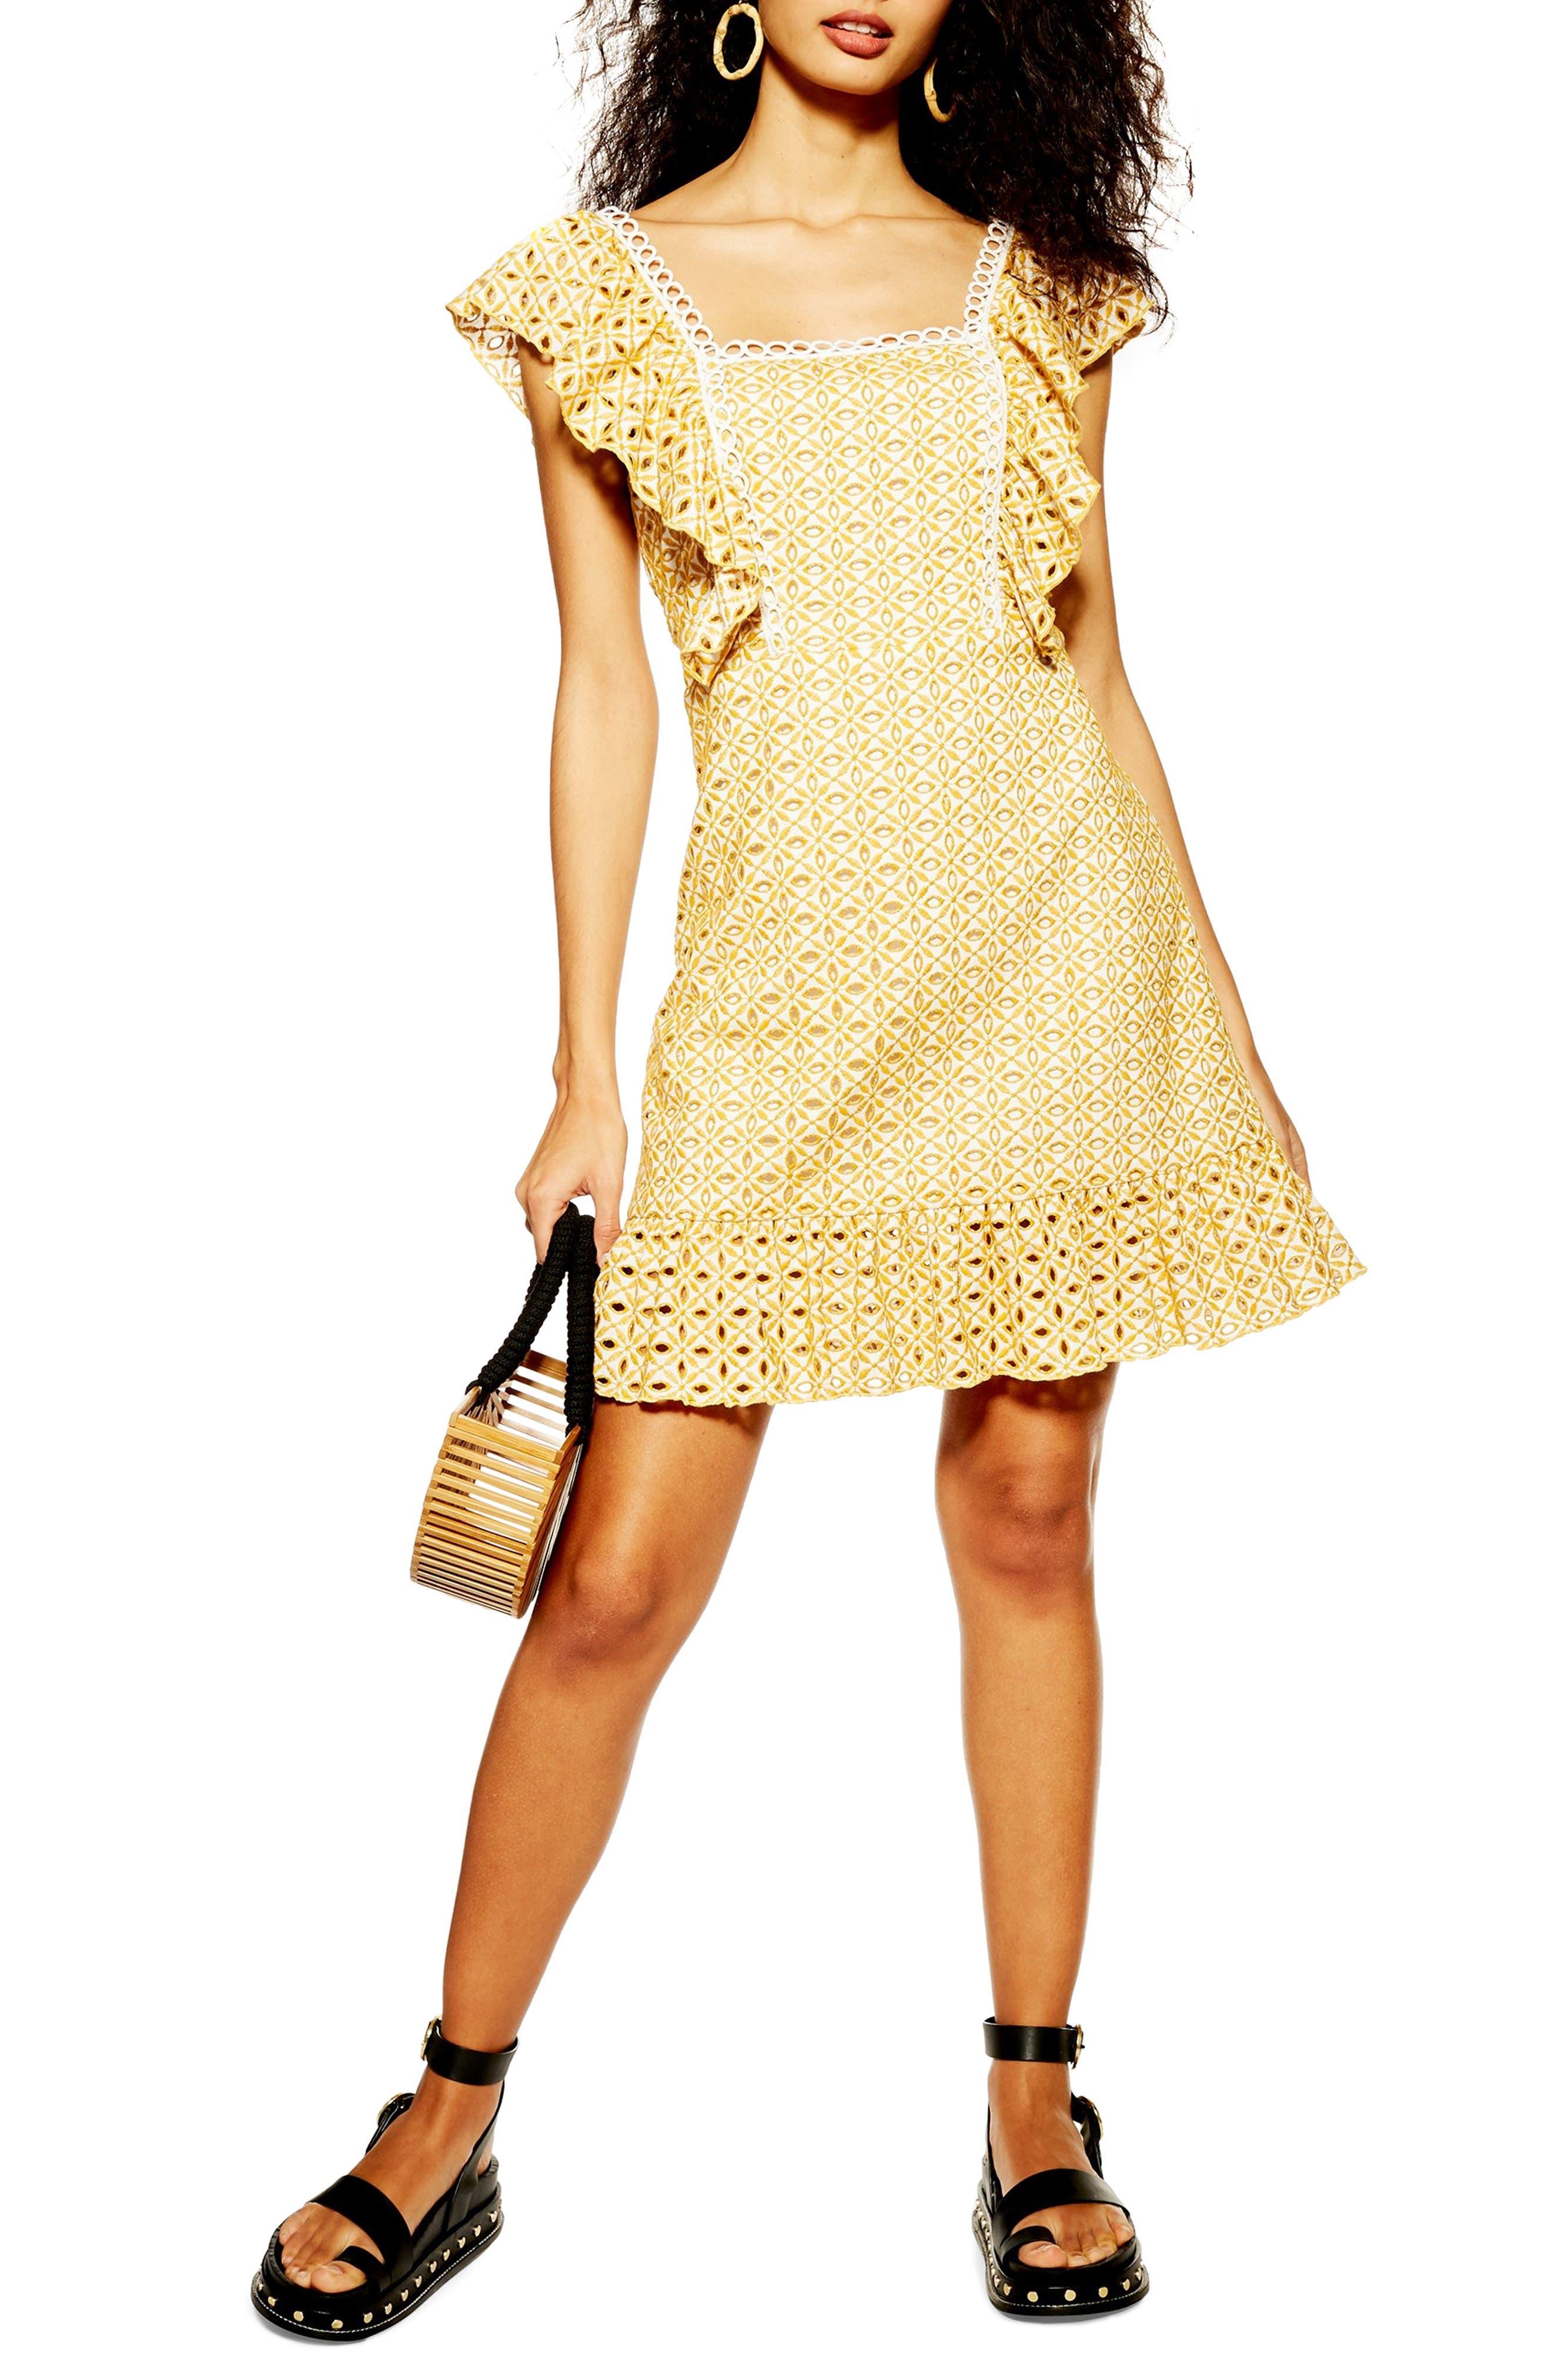 Topshop Broderie Ruffle Minidress, US (fits like 2-4) - Yellow